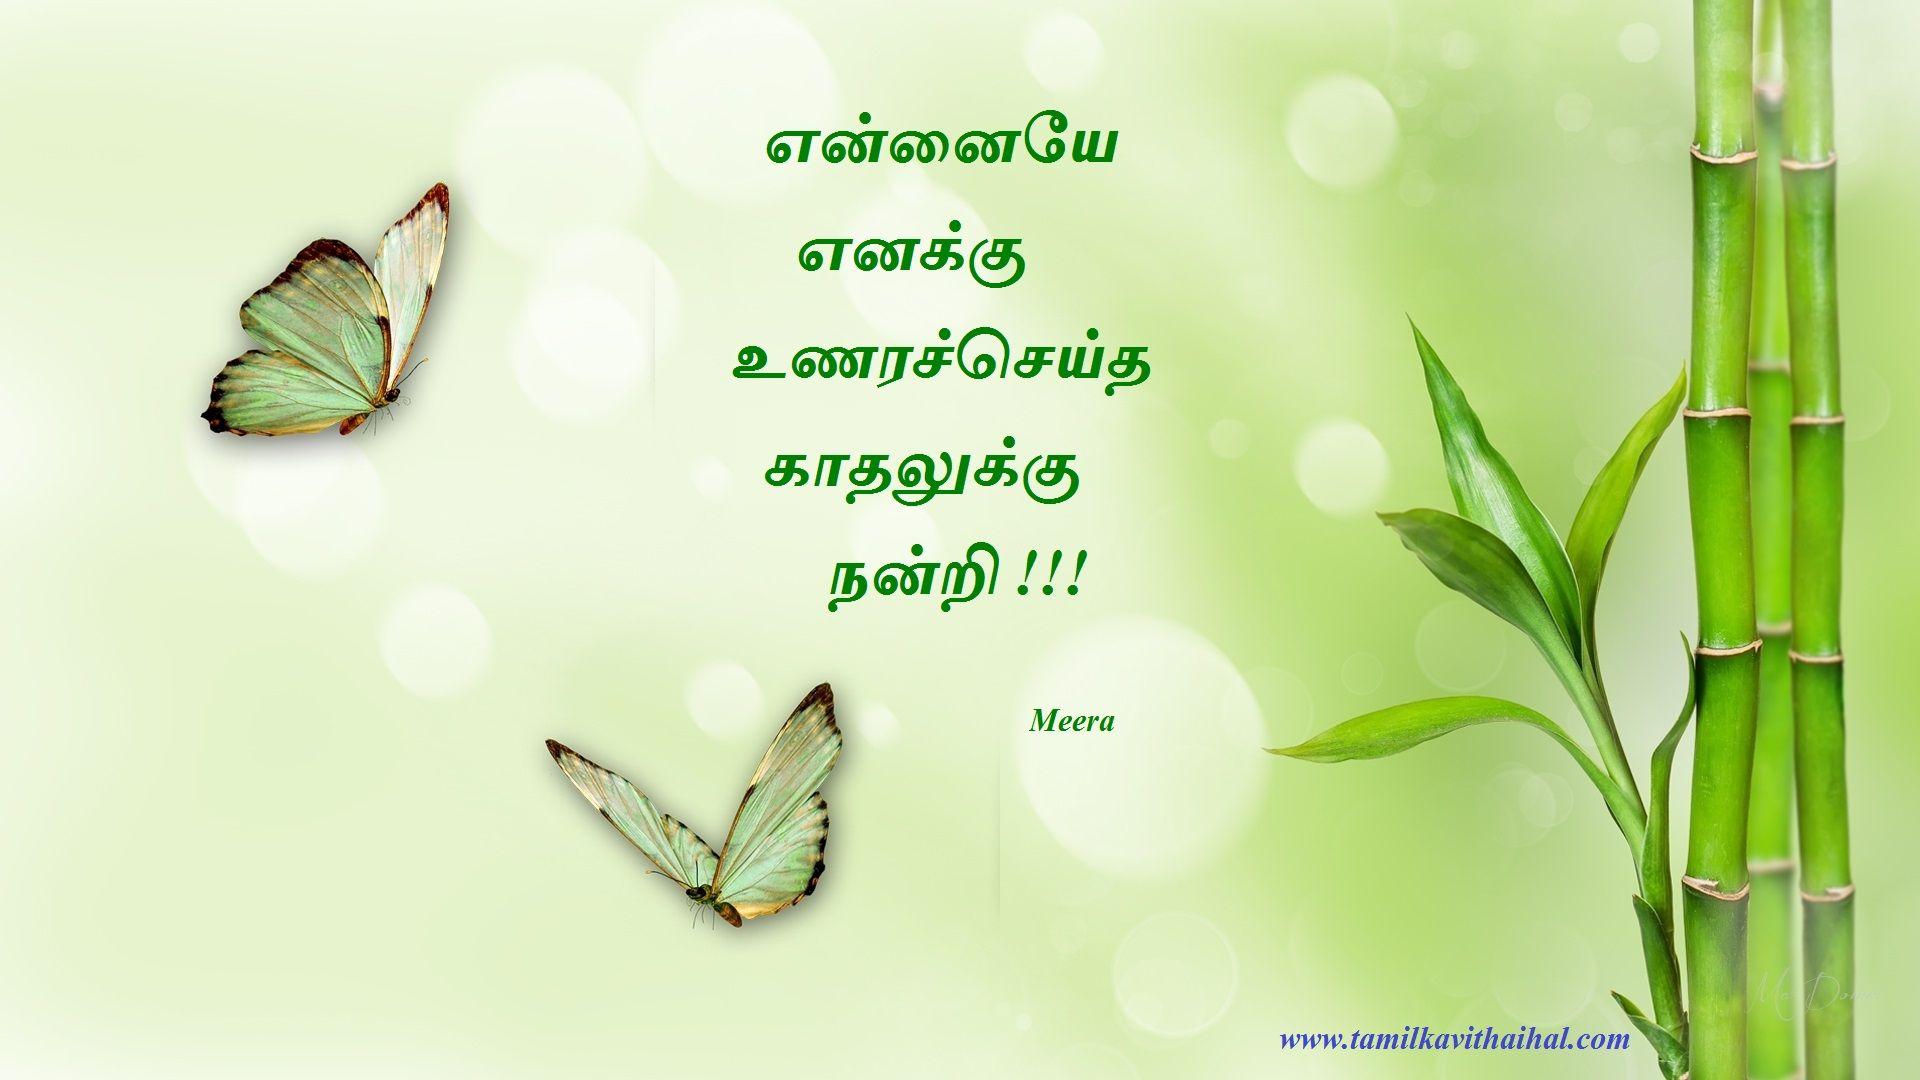 Love Kavithaigal Tamil Kavithai Quotes Latest Kavithaigal Meera Hd